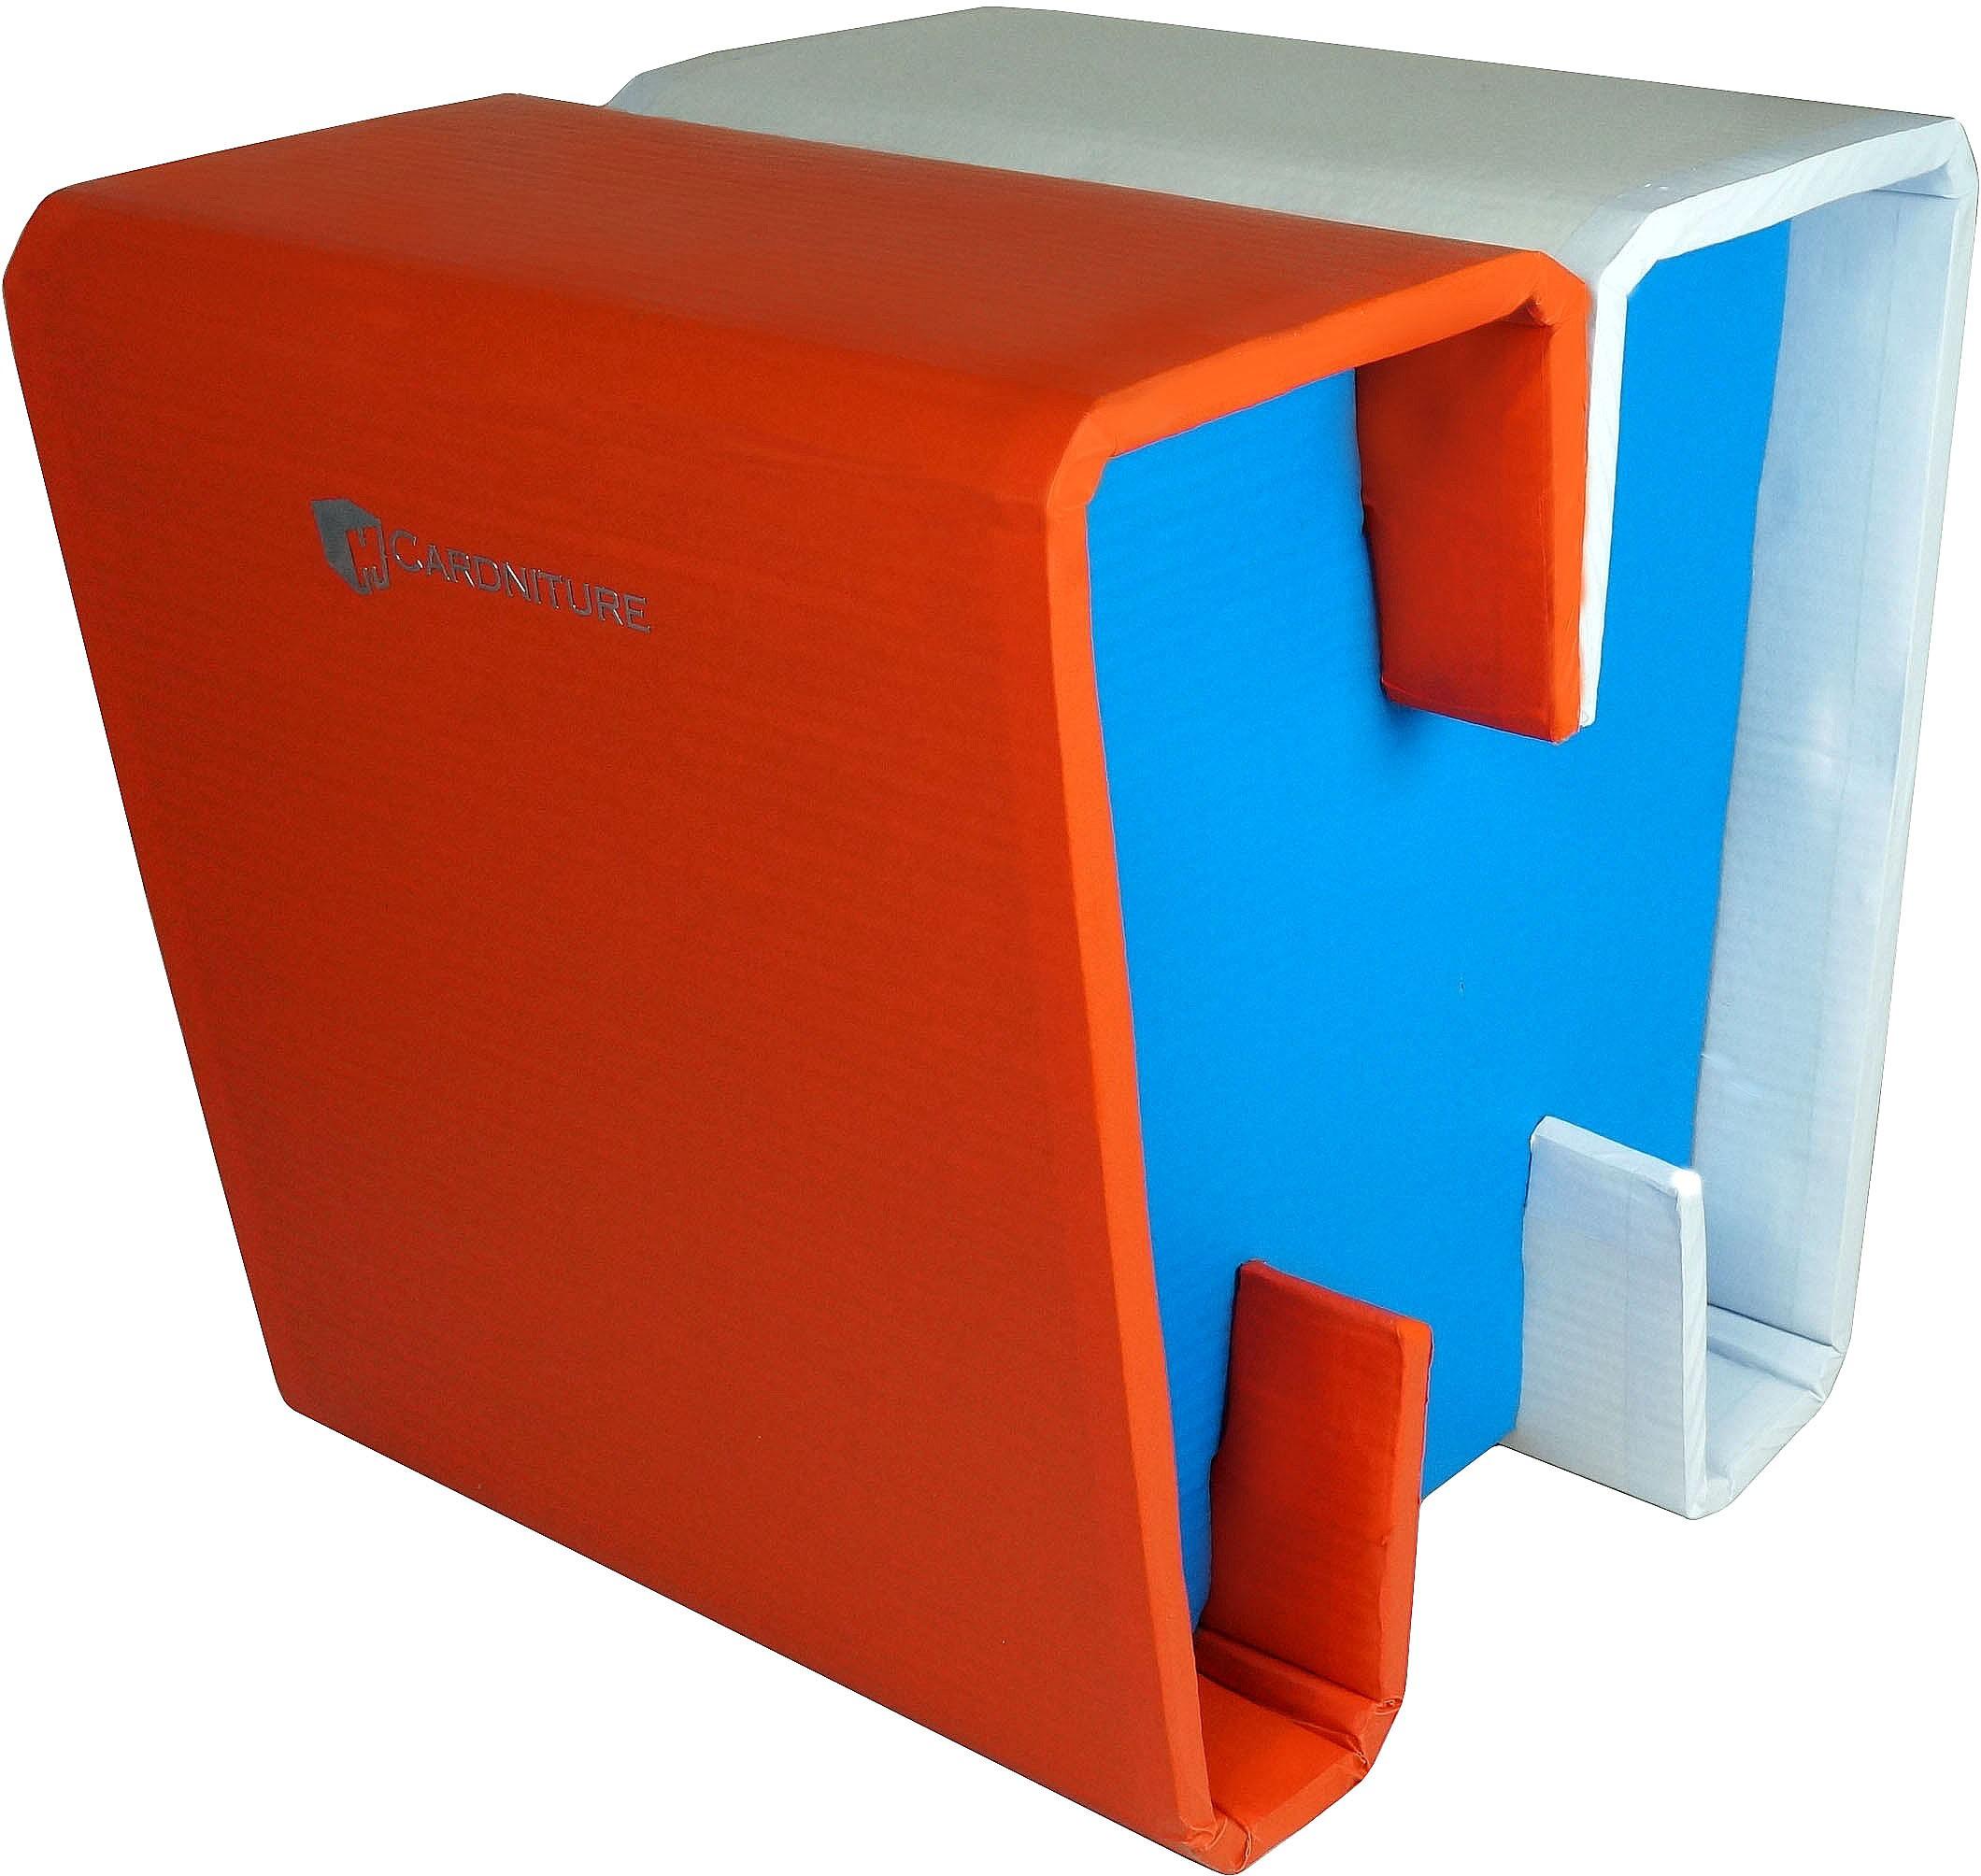 View Cardniture ZING Living & Bedroom Stool(Orange, Blue, White) Furniture (Cardniture)